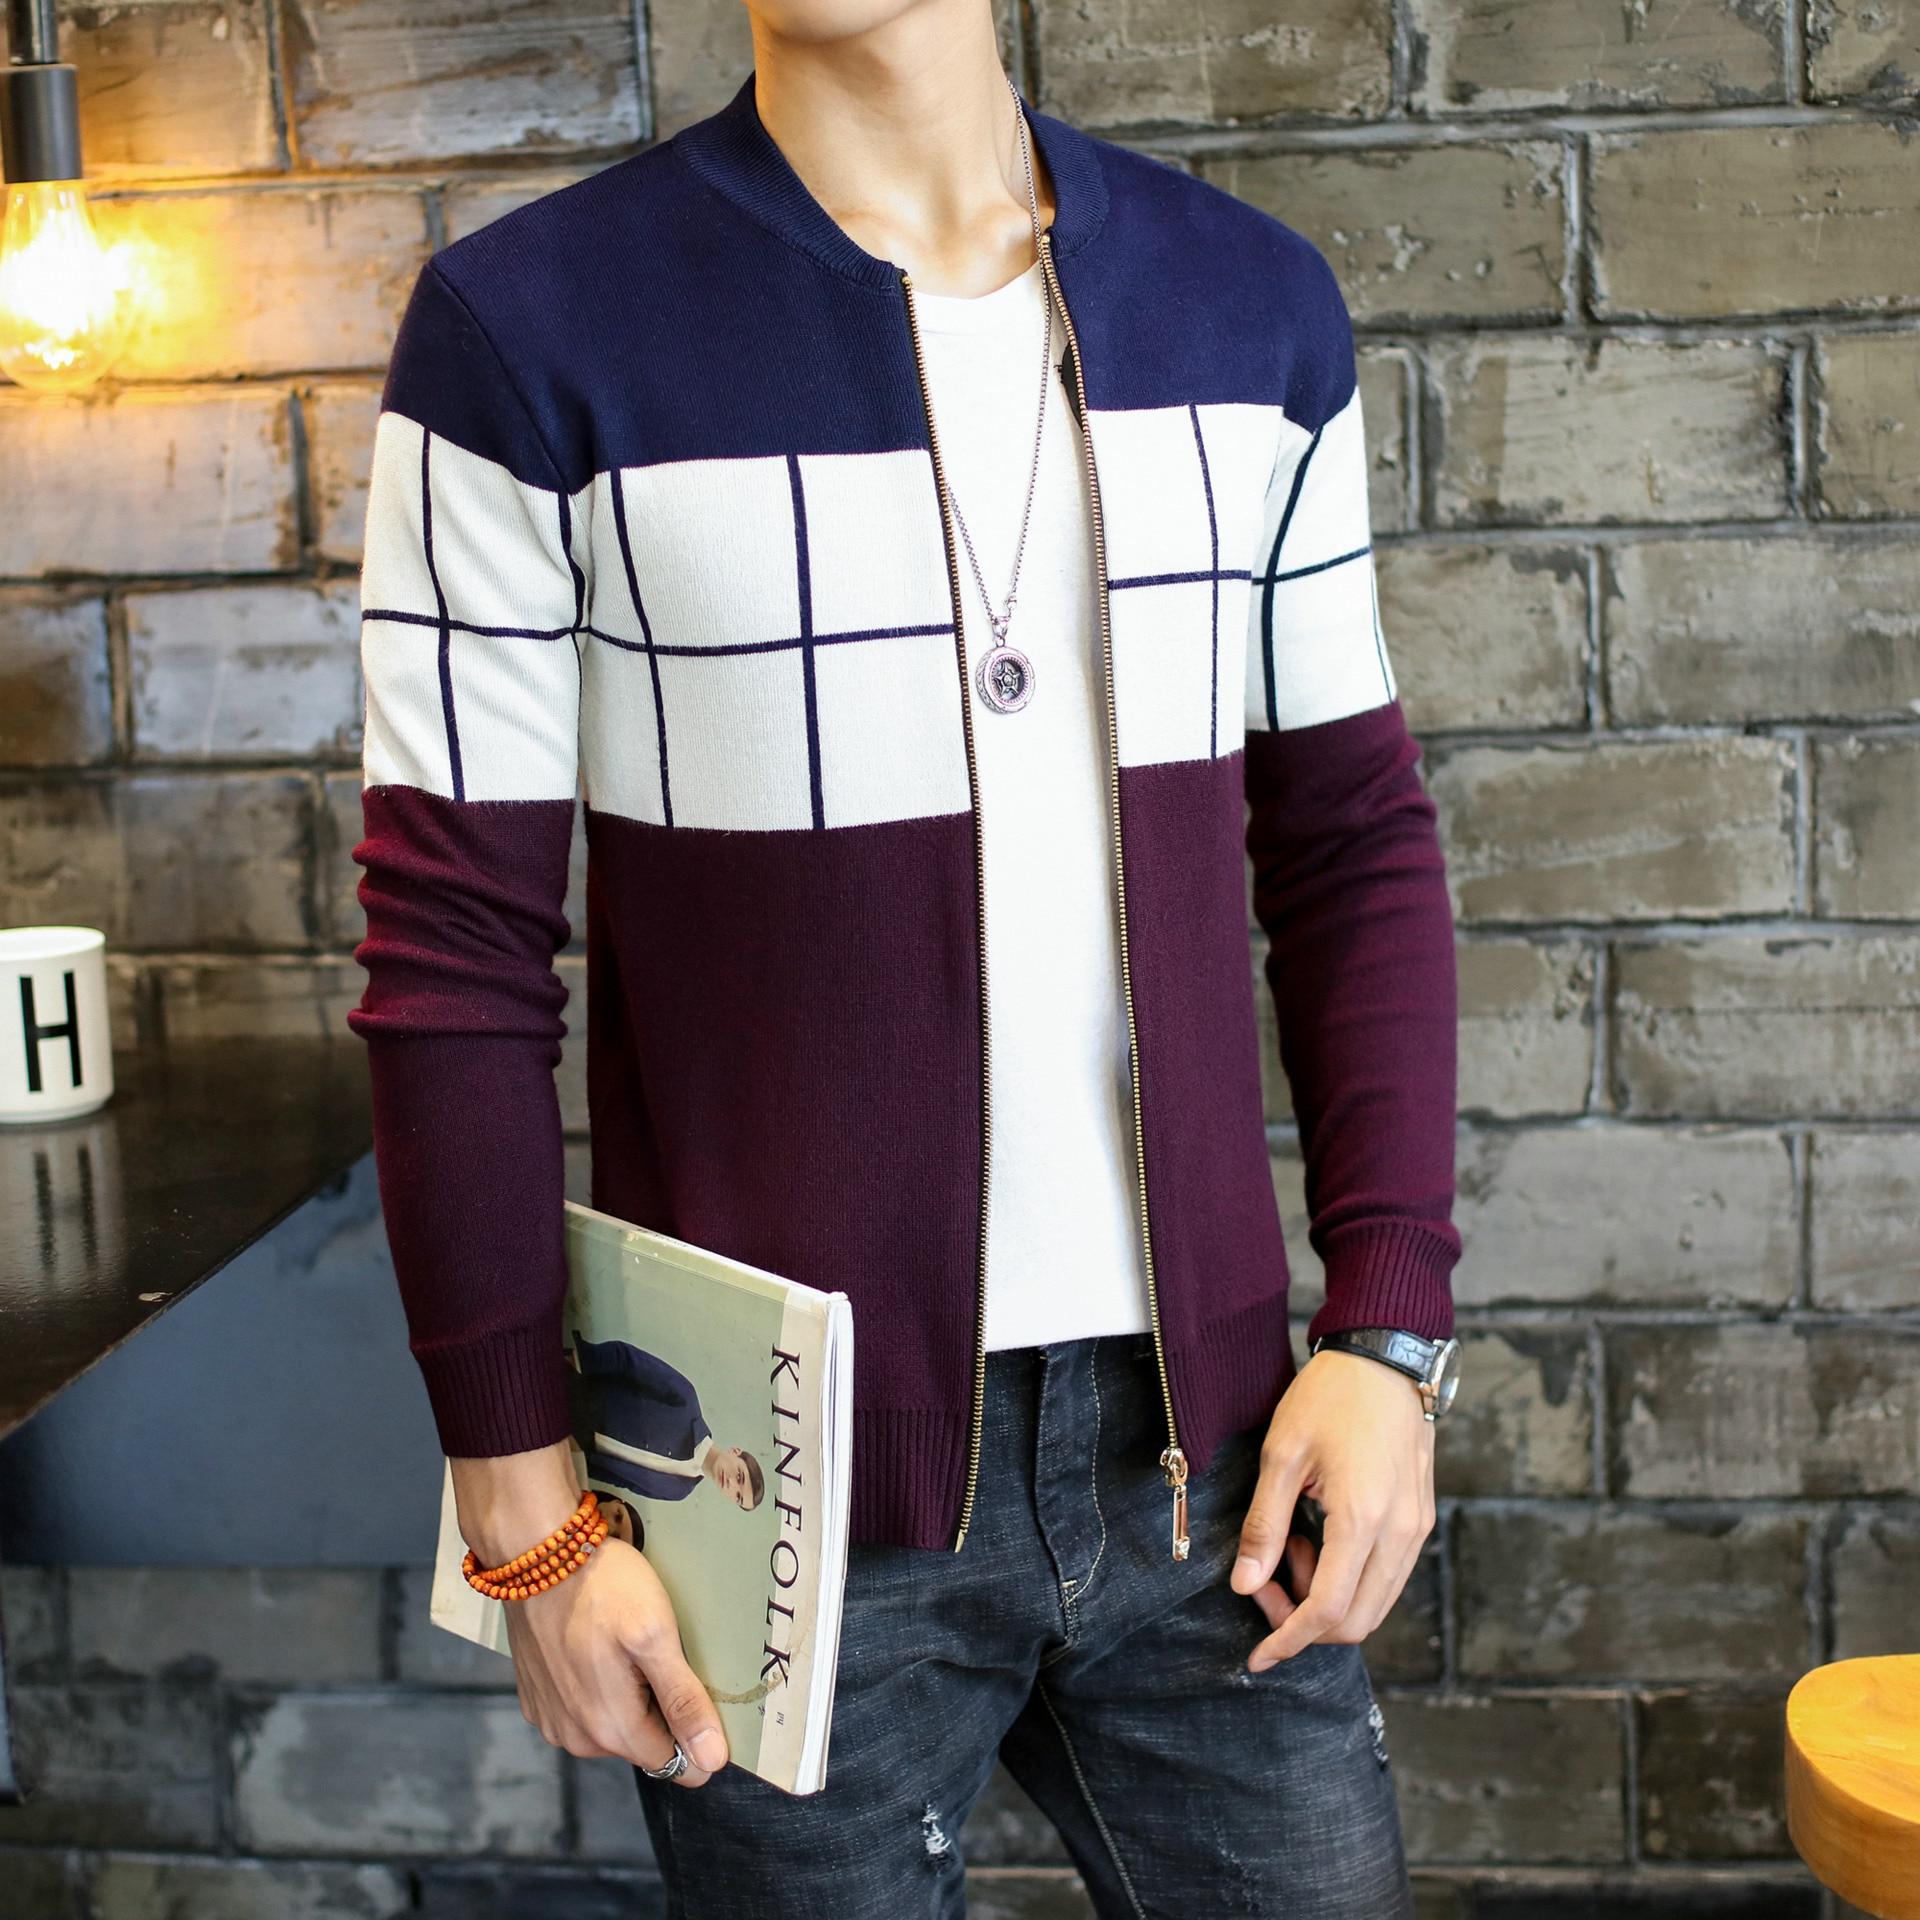 Sweater Warm Autumn Winter Men Fashion Casual X9-171019Z Nice Hot-Selling Wholesale Cheap